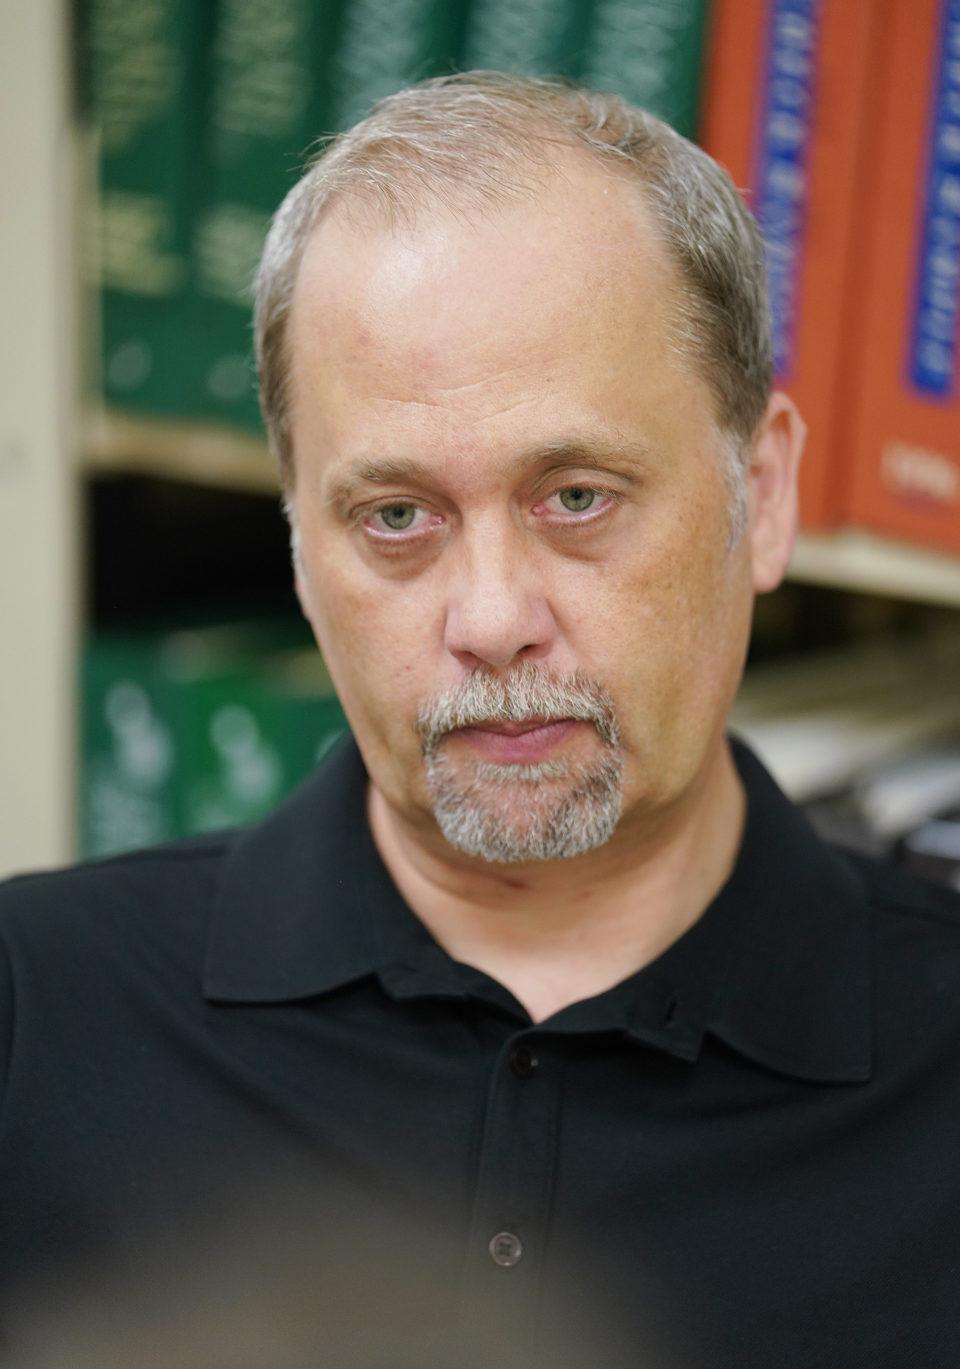 Honolulu Medical Examiner, Highest Paid City Employee, Resigns